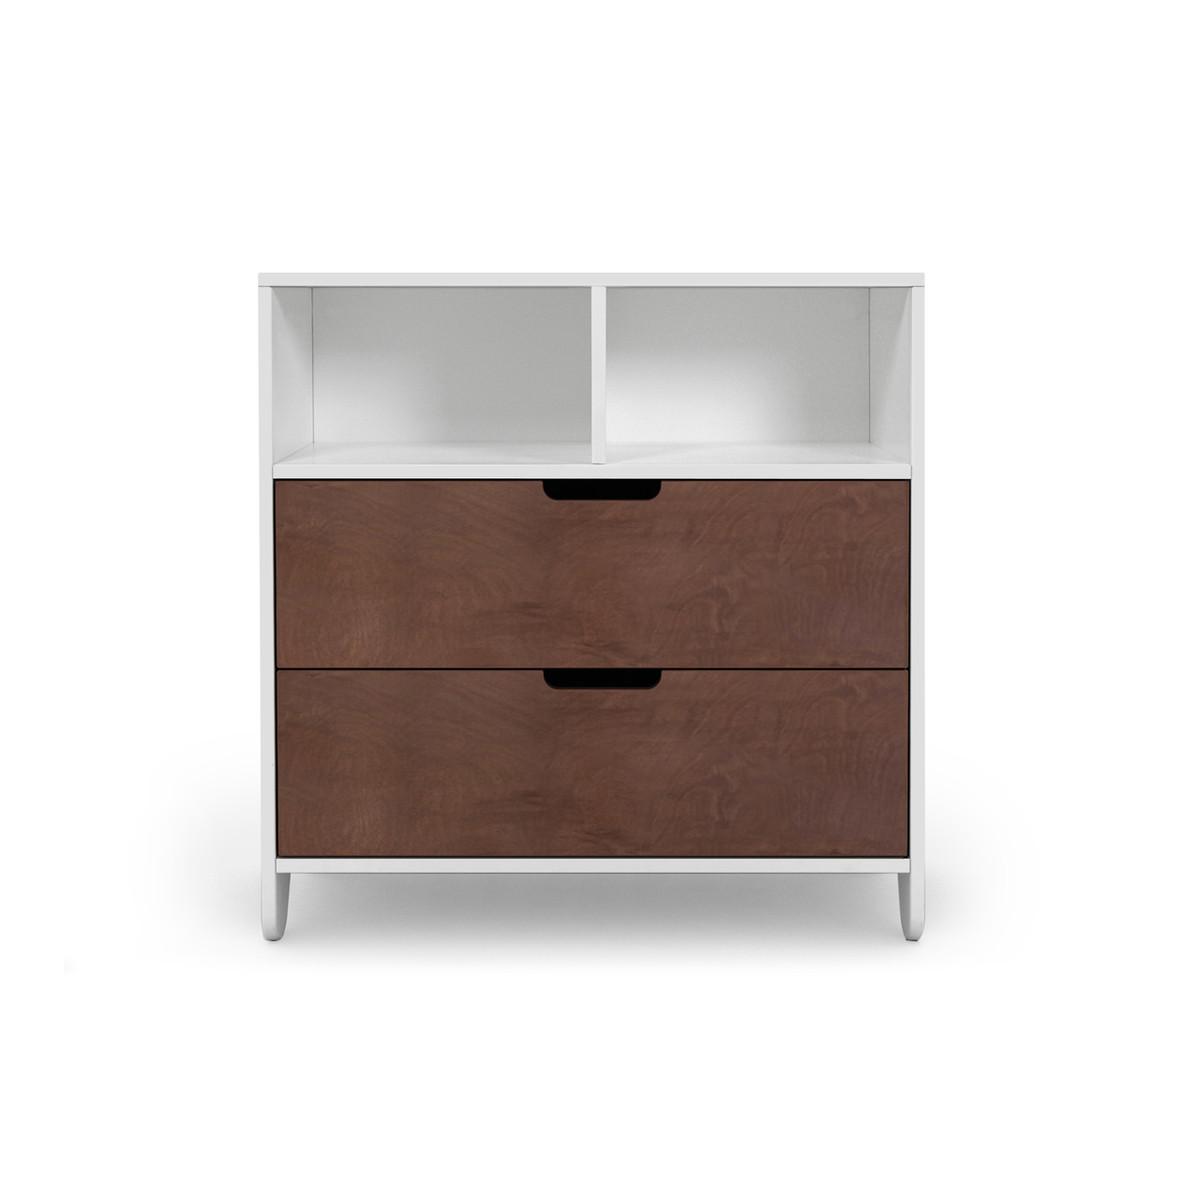 Hiya Dresser with walnut stained drawers